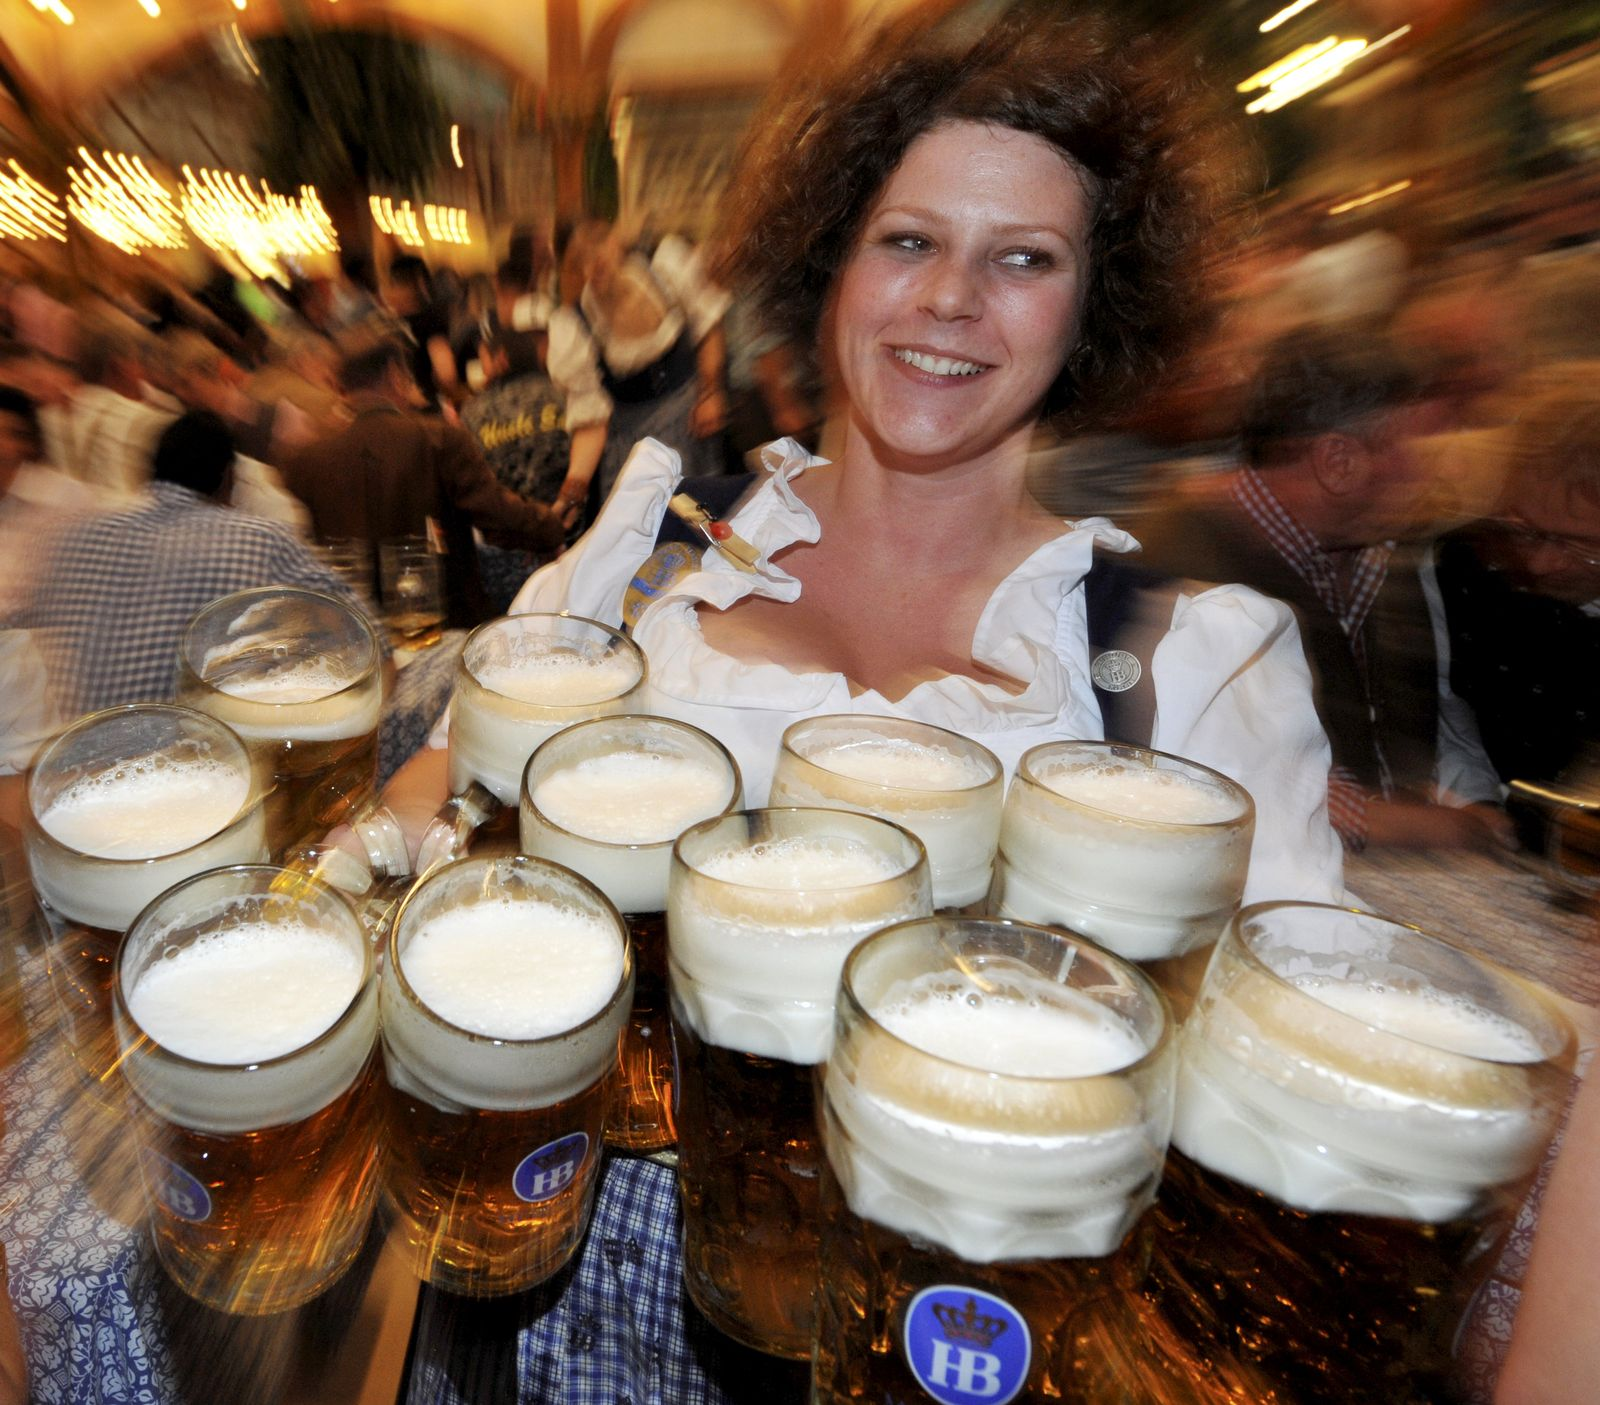 Oktoberfest 2012 - Kellnerin Helga mit elf Maß Bier